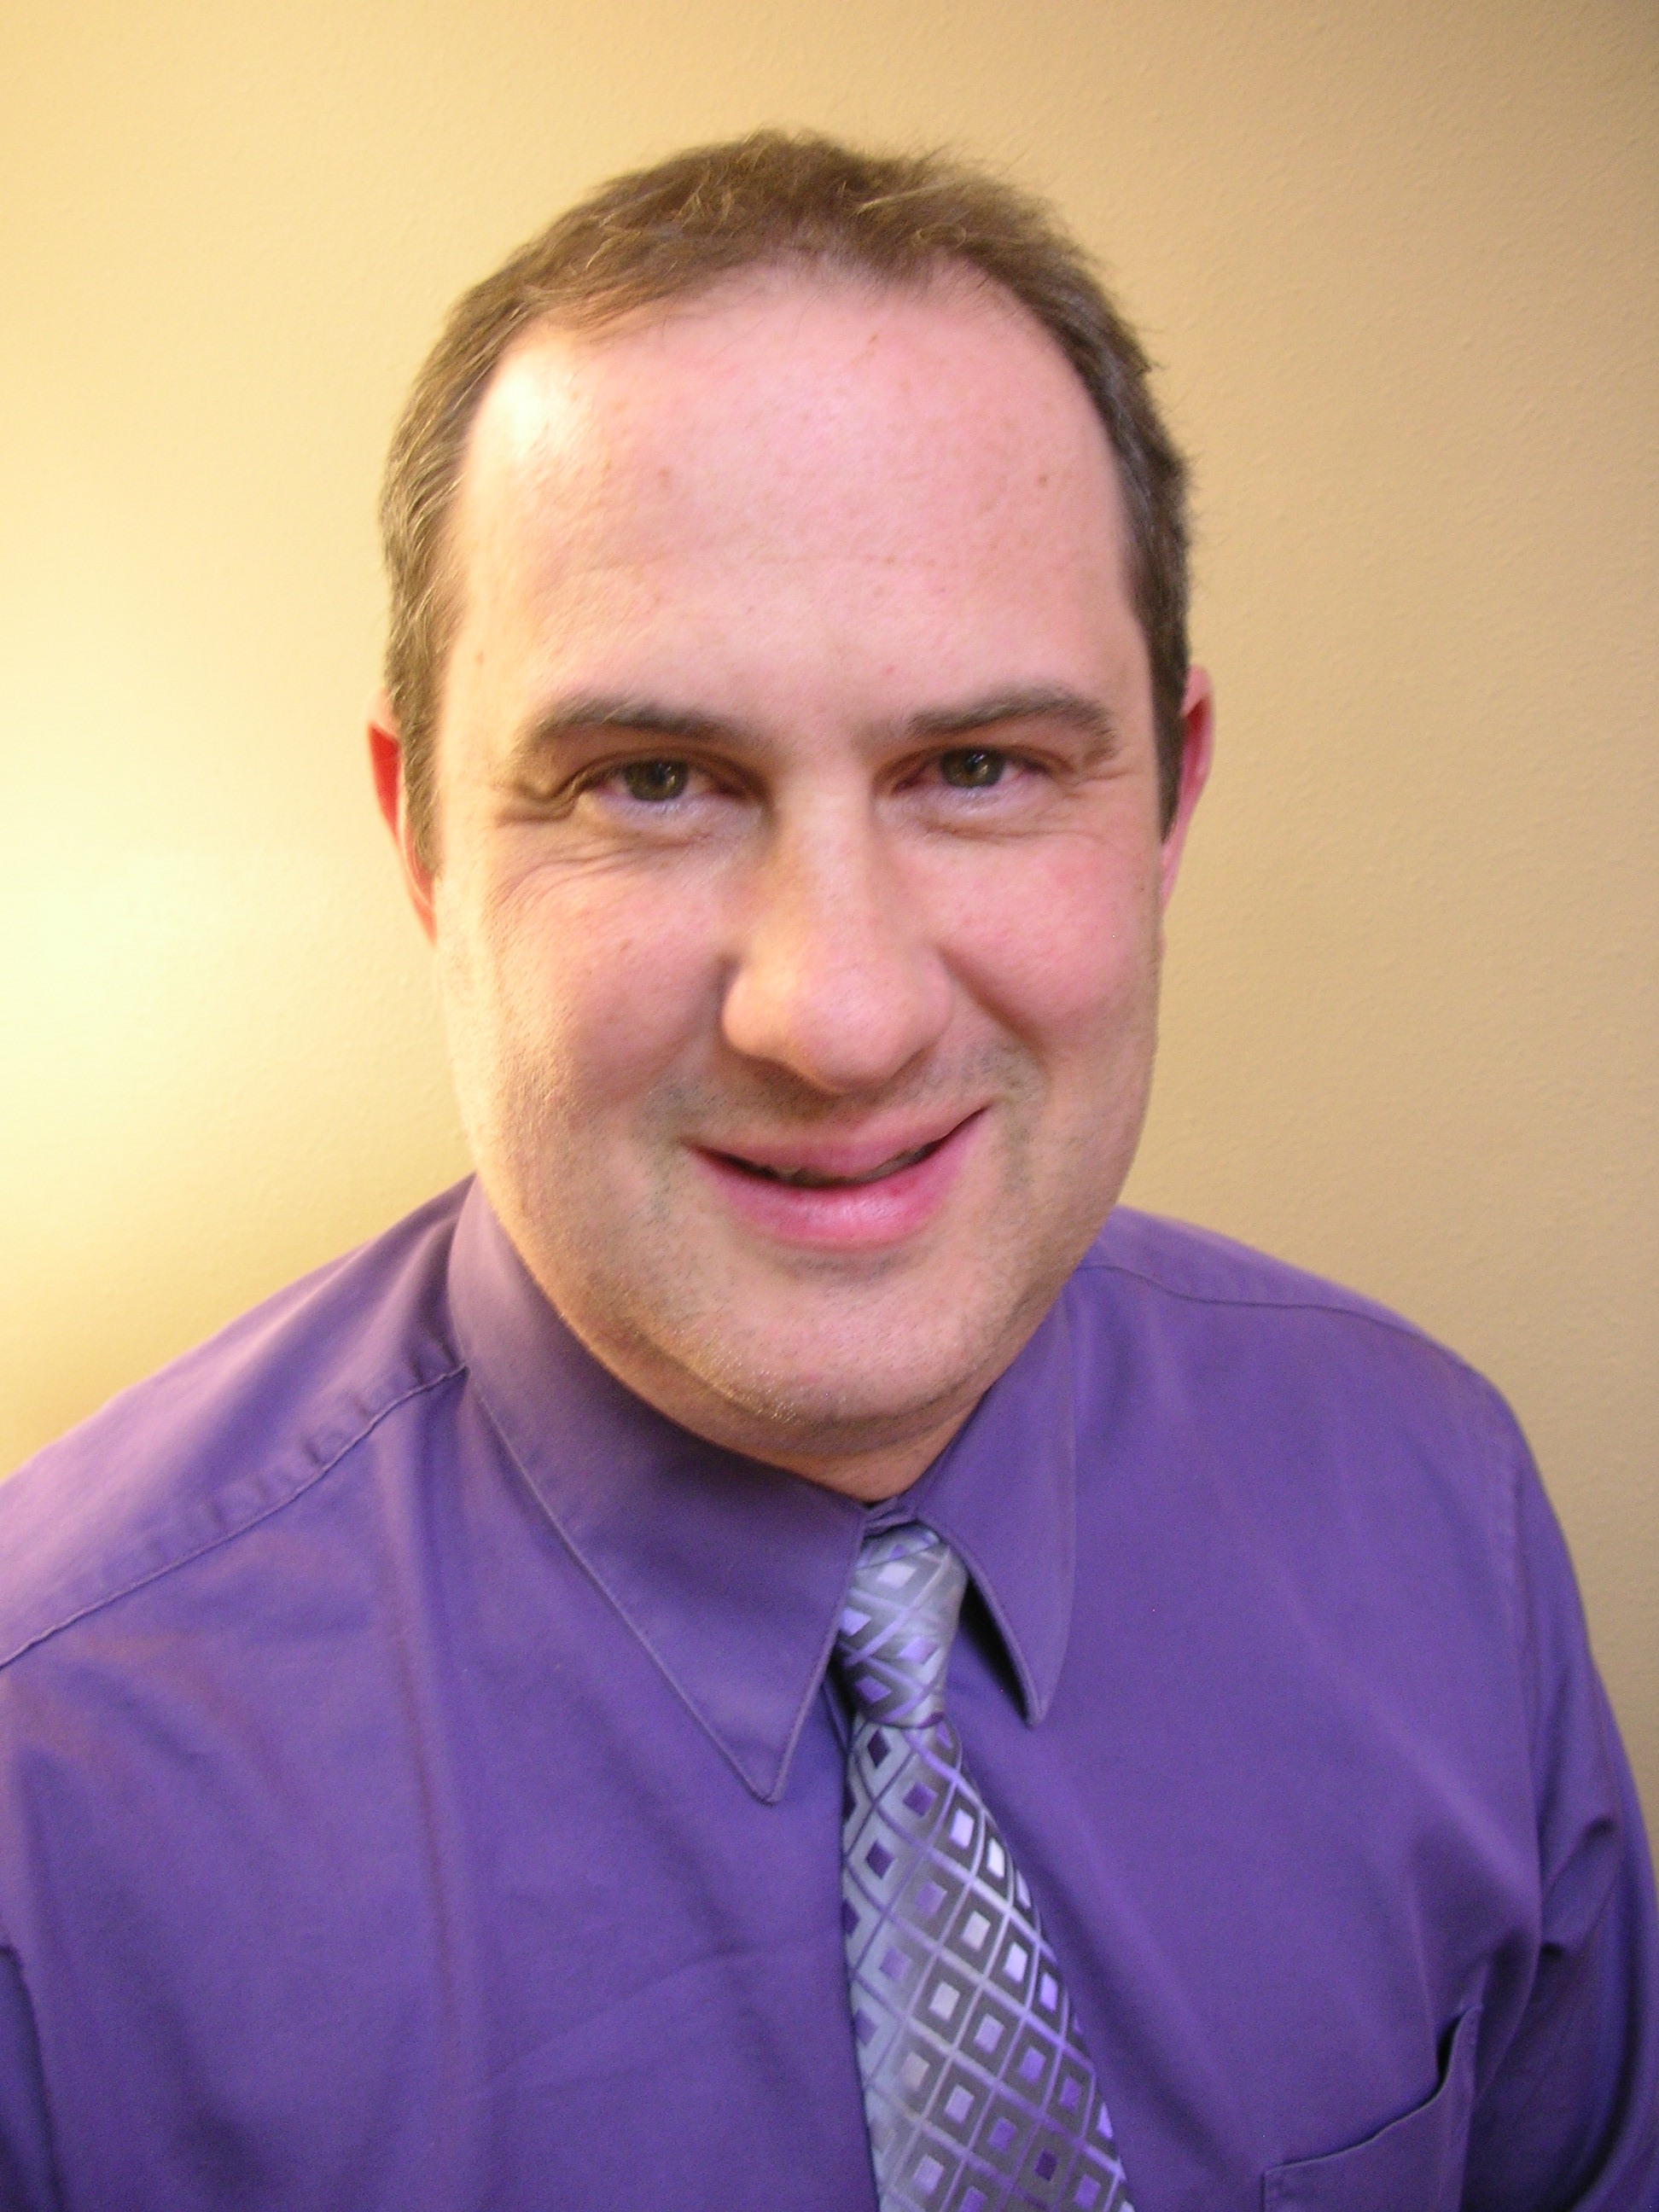 Dr. Glenn Sykes, DC - Chiropractic Physician